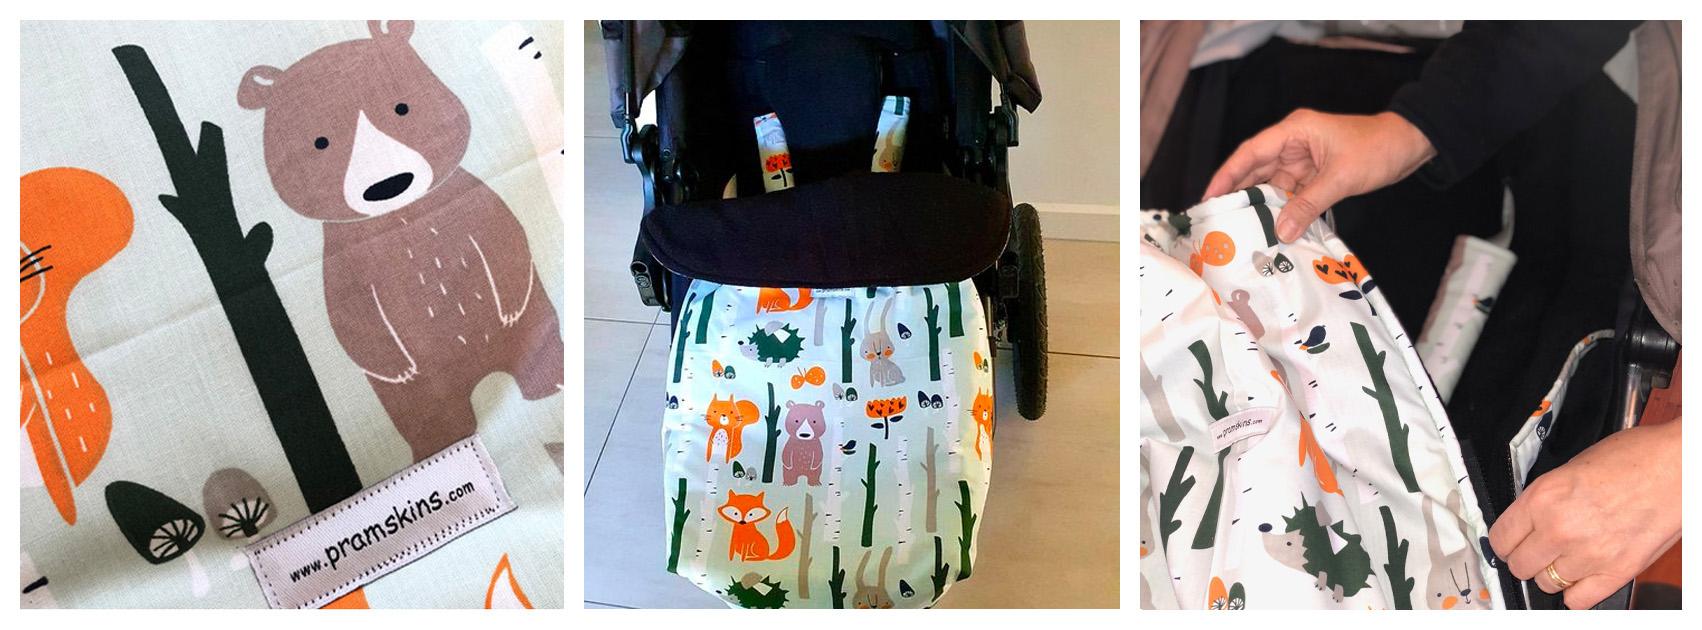 category-collage-bob-revolution-snuggle-bags.jpg